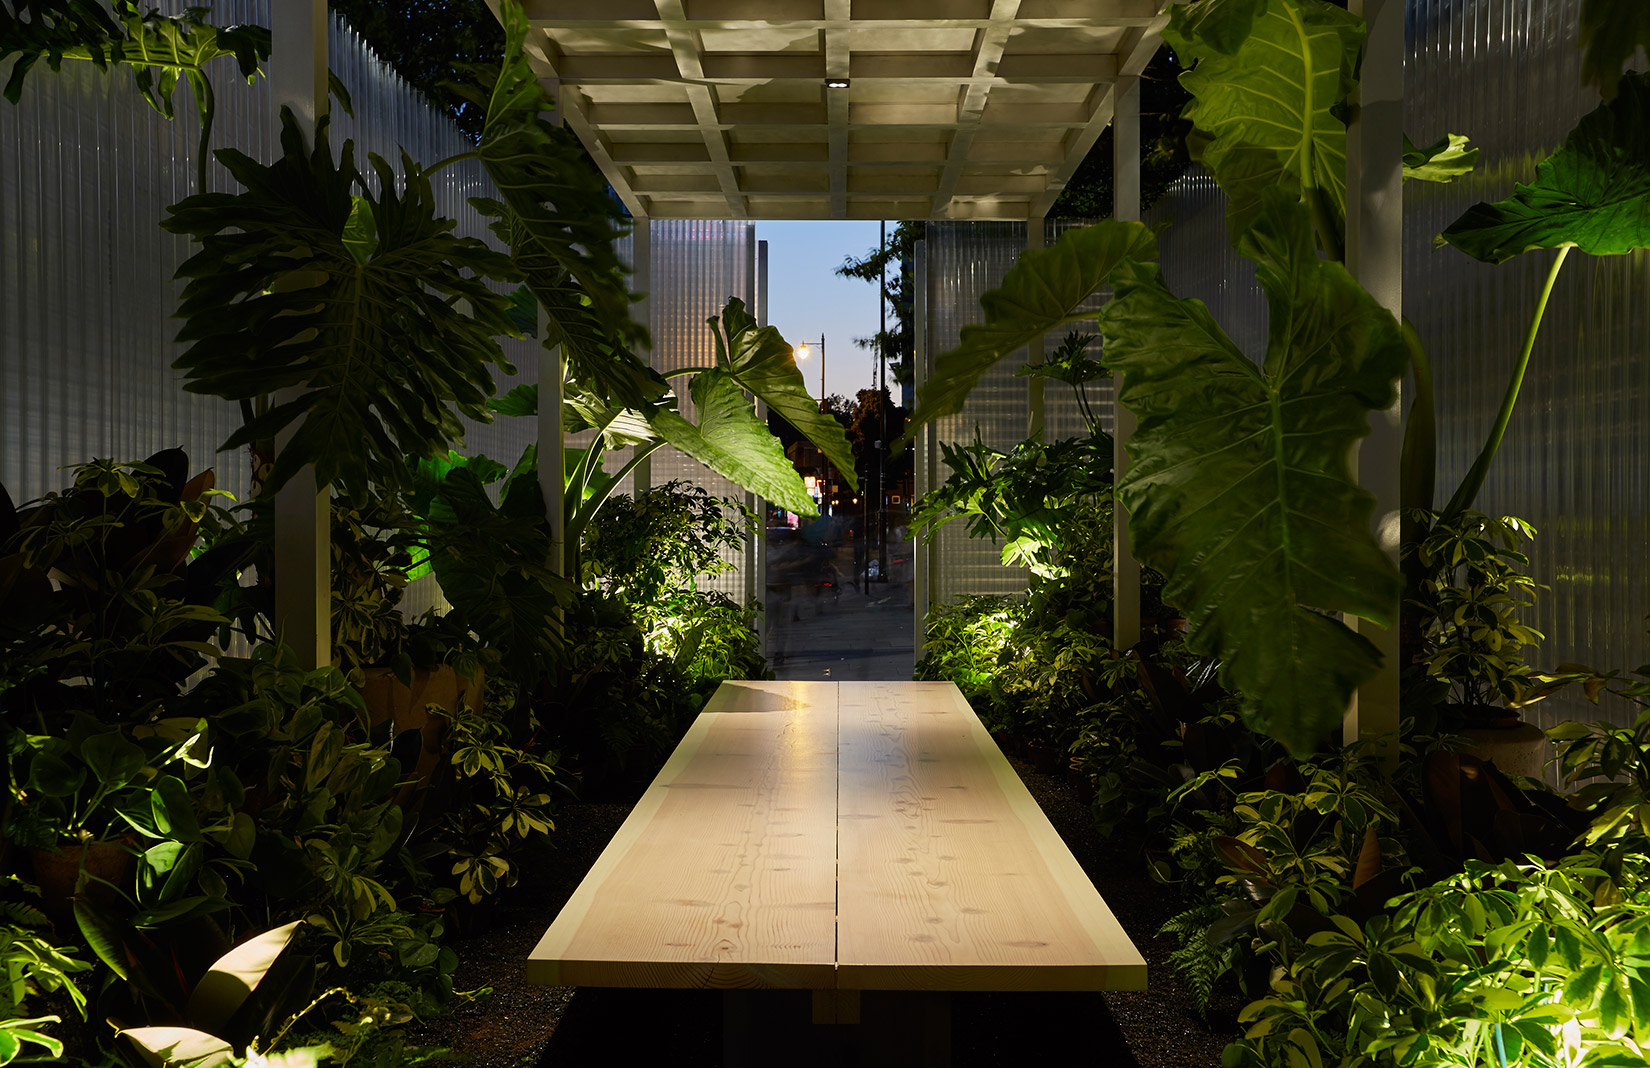 Designer Asif Khan Plants Mini Living Forests In East